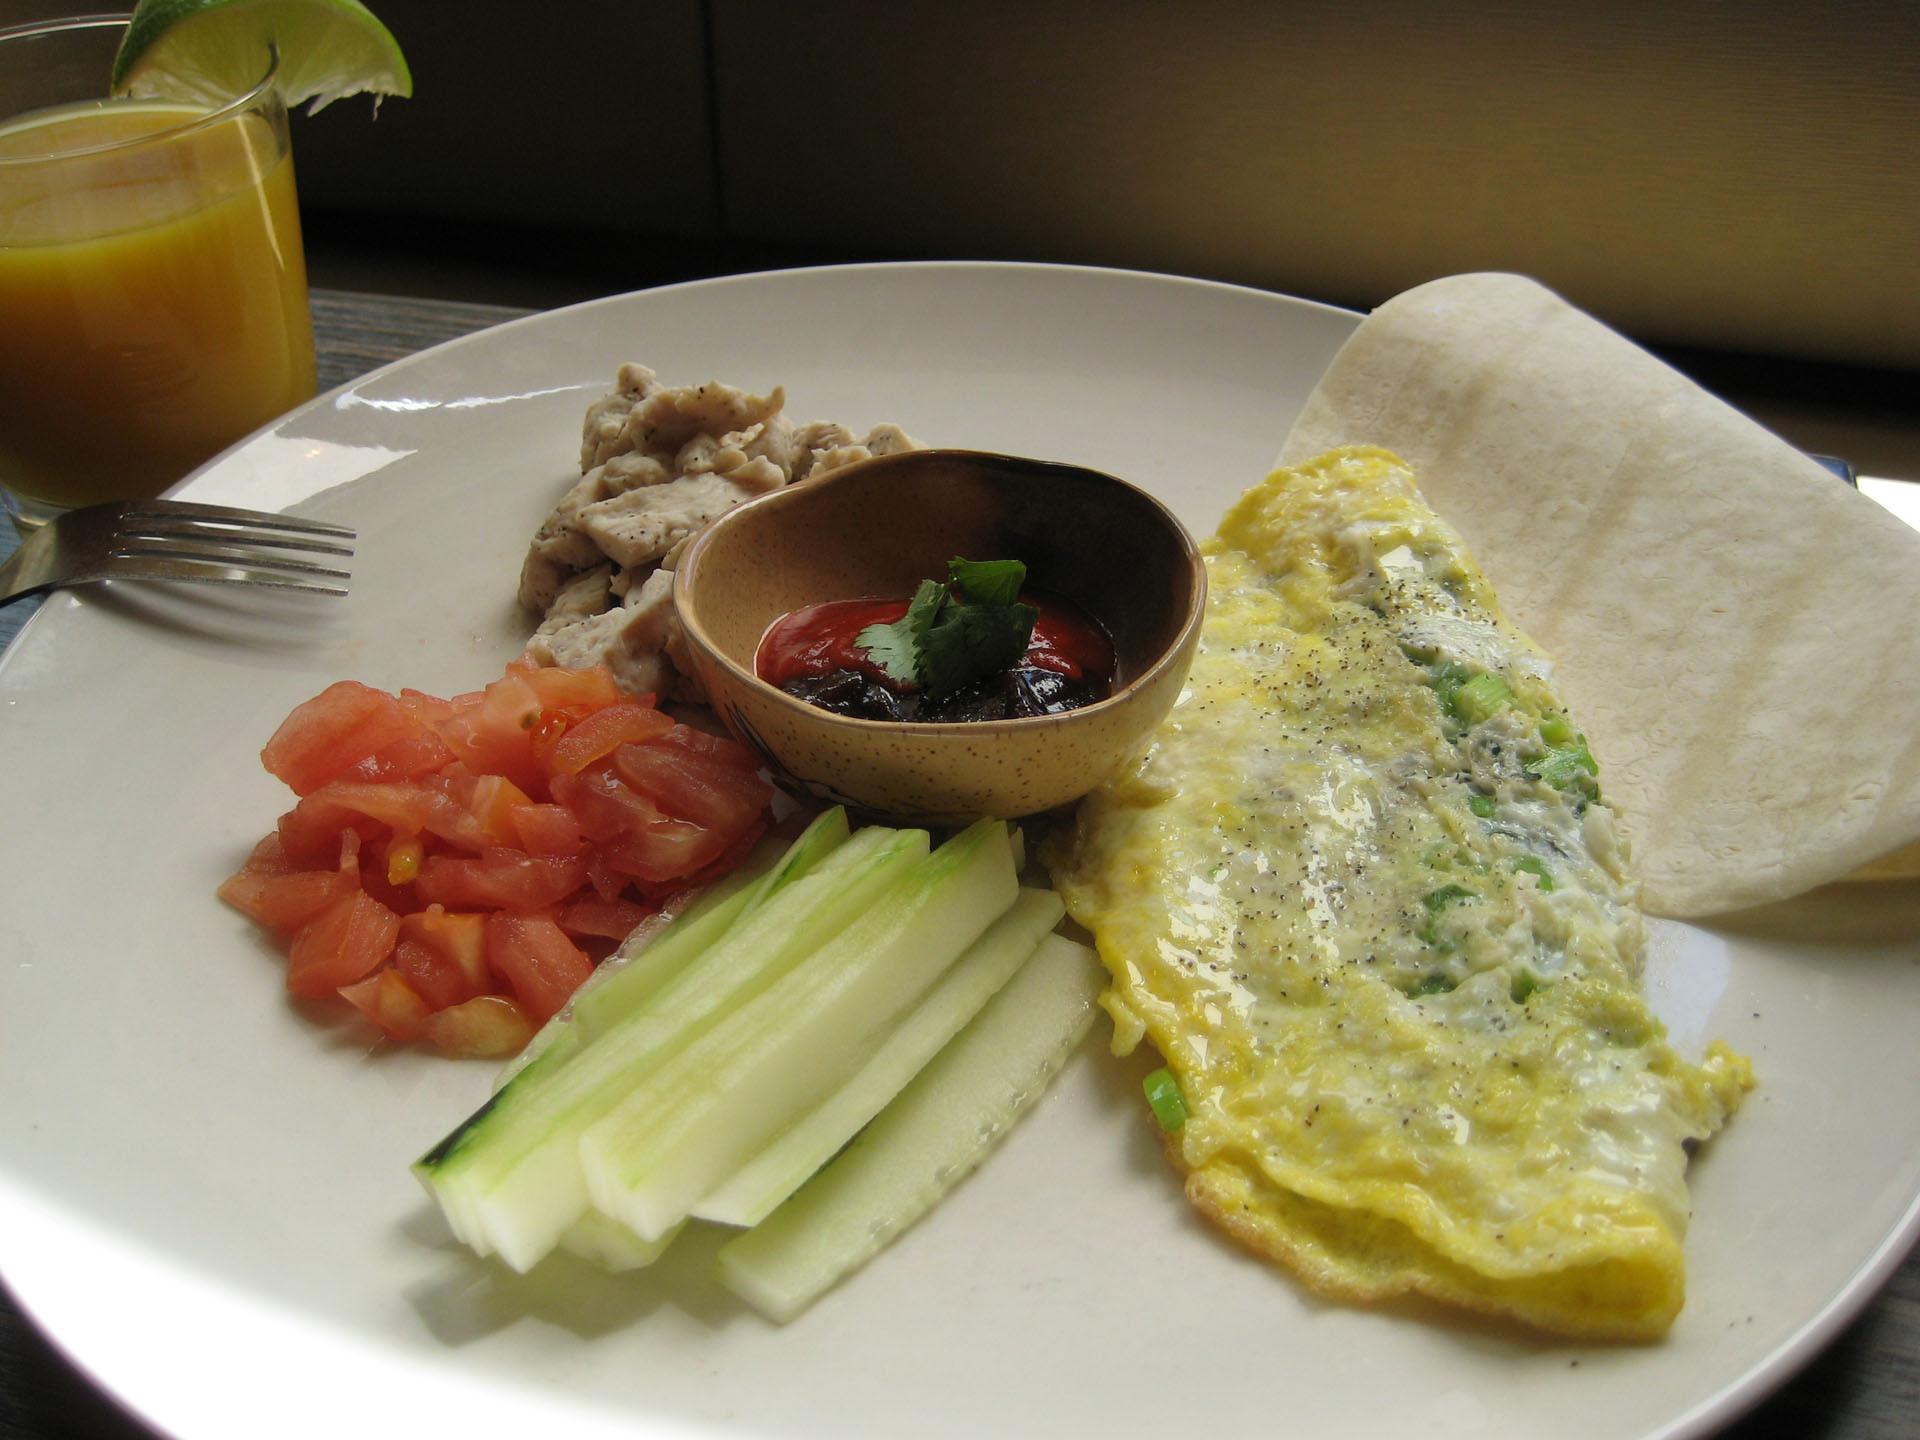 Healthy Breakfast Alternatives  Healthy Breakfast Burrito Alternative Fangalicious